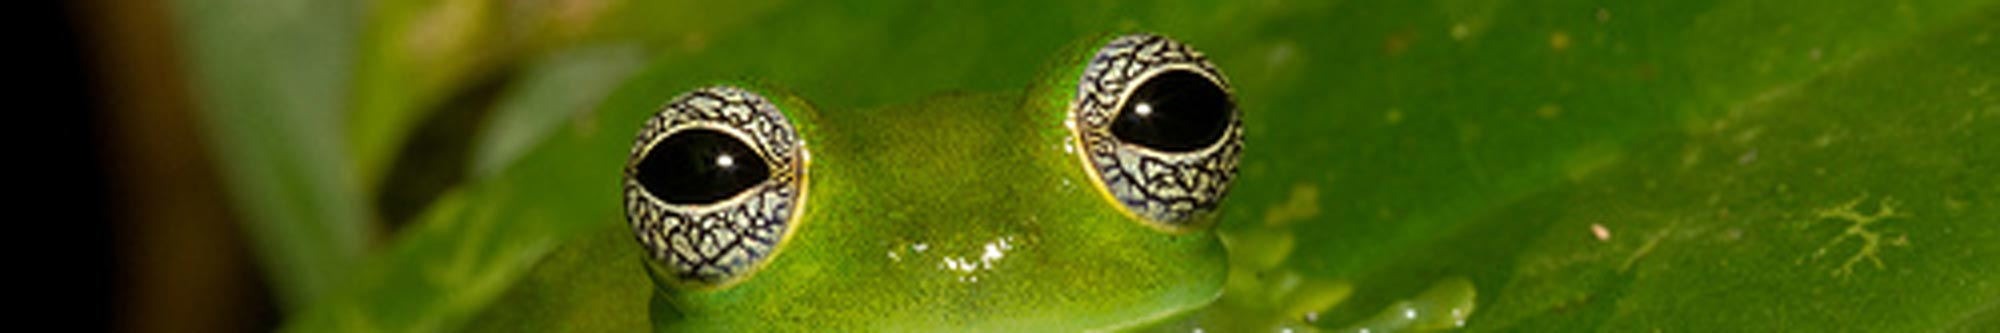 glassfroggy1